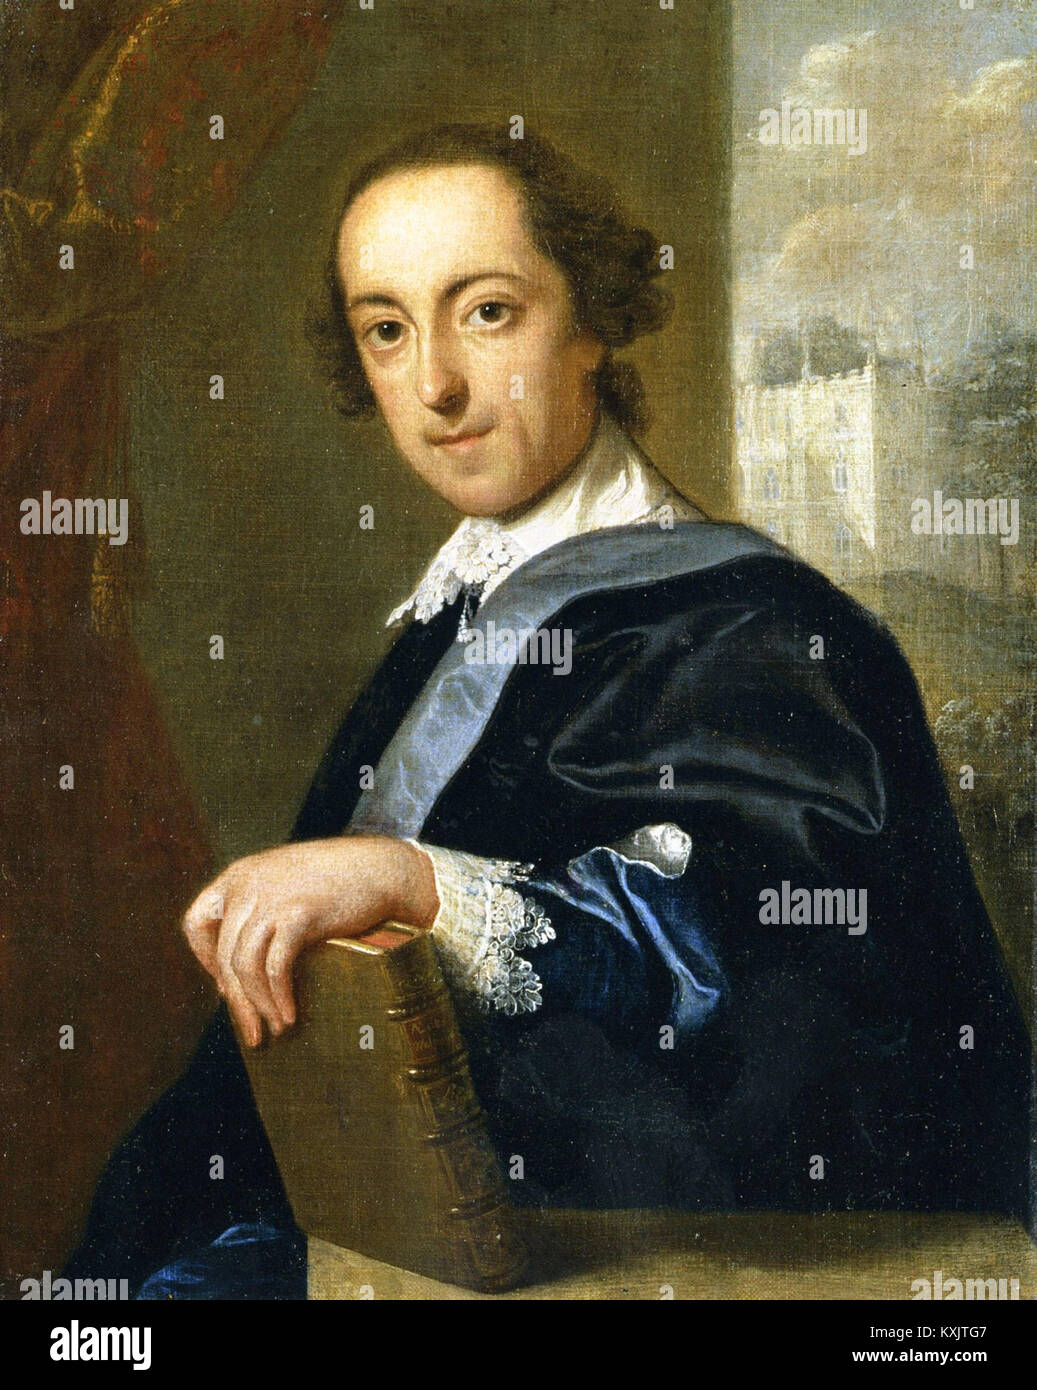 Horace Walpole, circa 1755. Horatio Walpole, 4th Earl of Orford, Horace Walpole - Stock Image